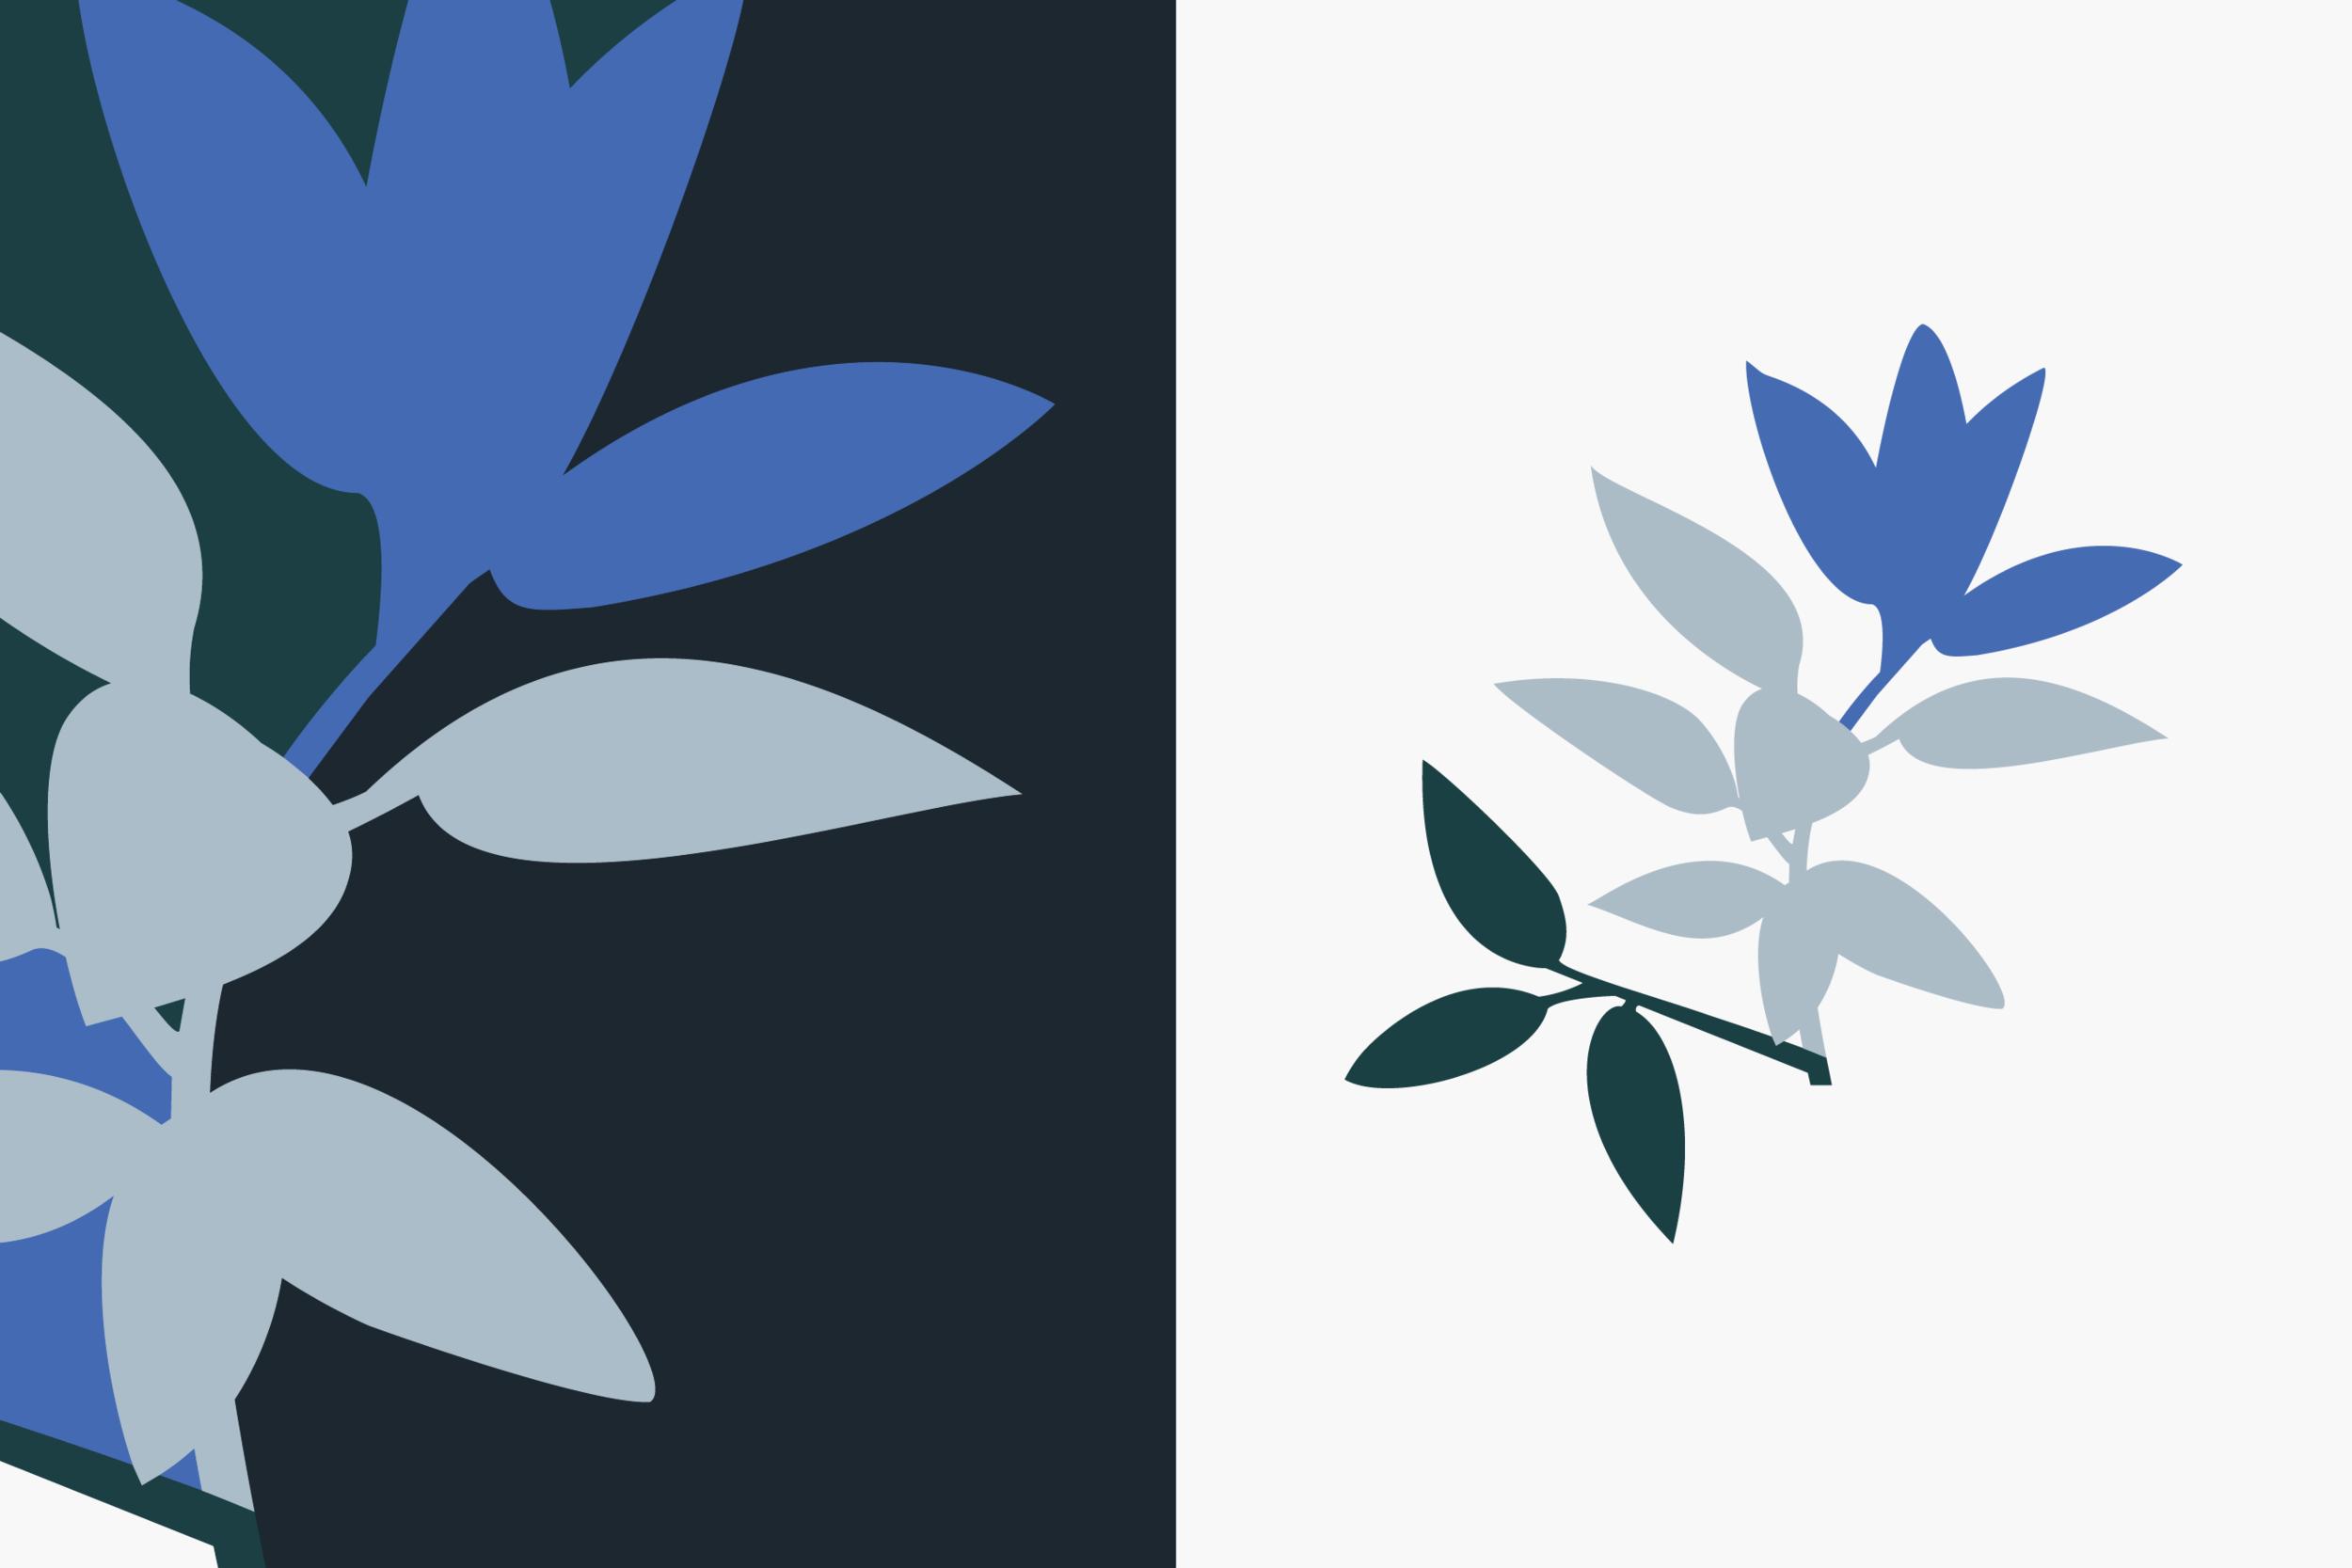 KaterinaLeslie_SageGardens_Pattern&Icon.png